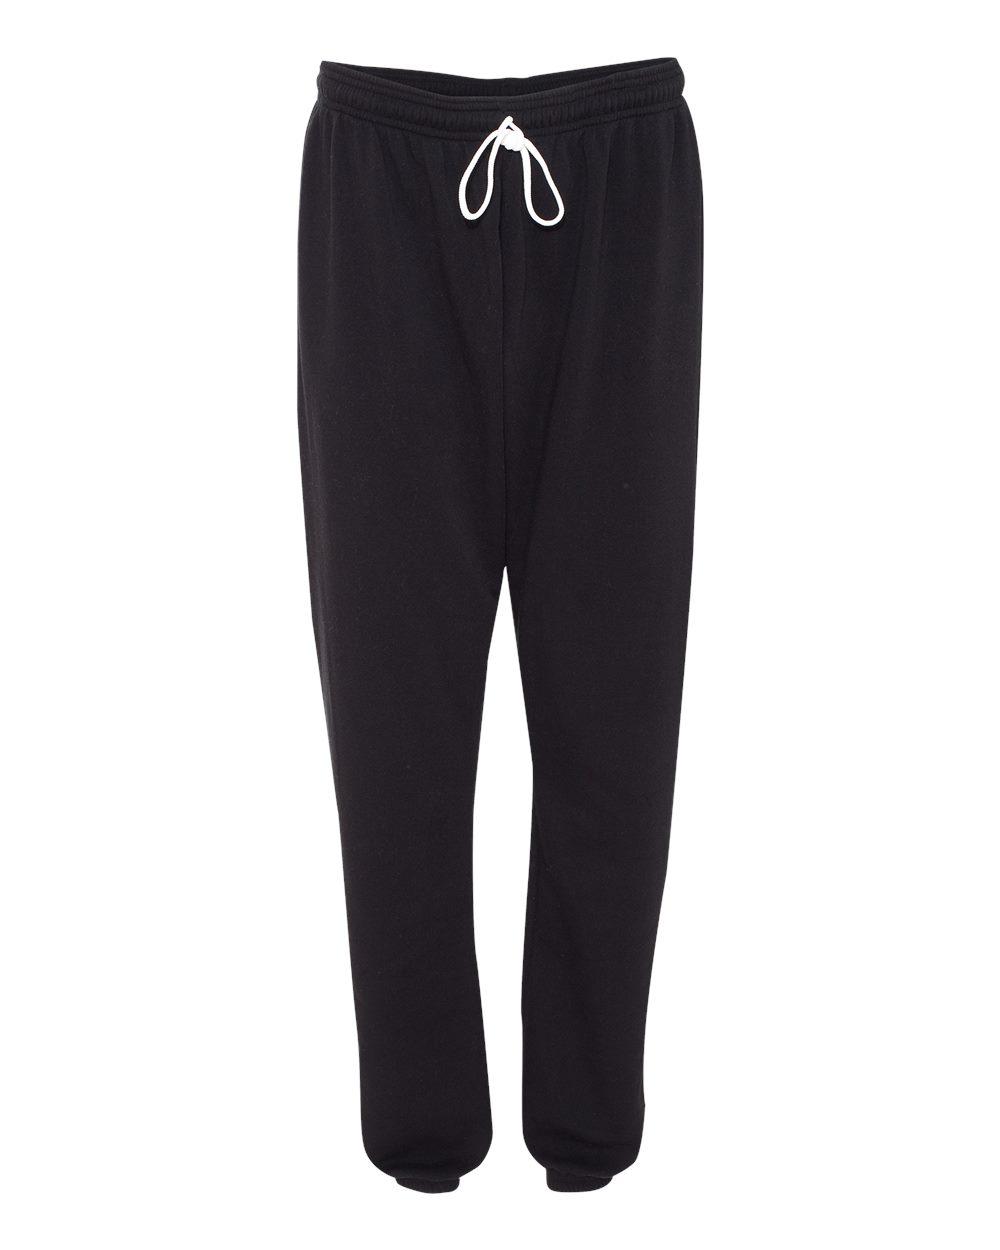 Bella-Canvas-Unisex-Long-Scrunch-Fleece-Pants-Workout-3737-up-to-2XL thumbnail 6